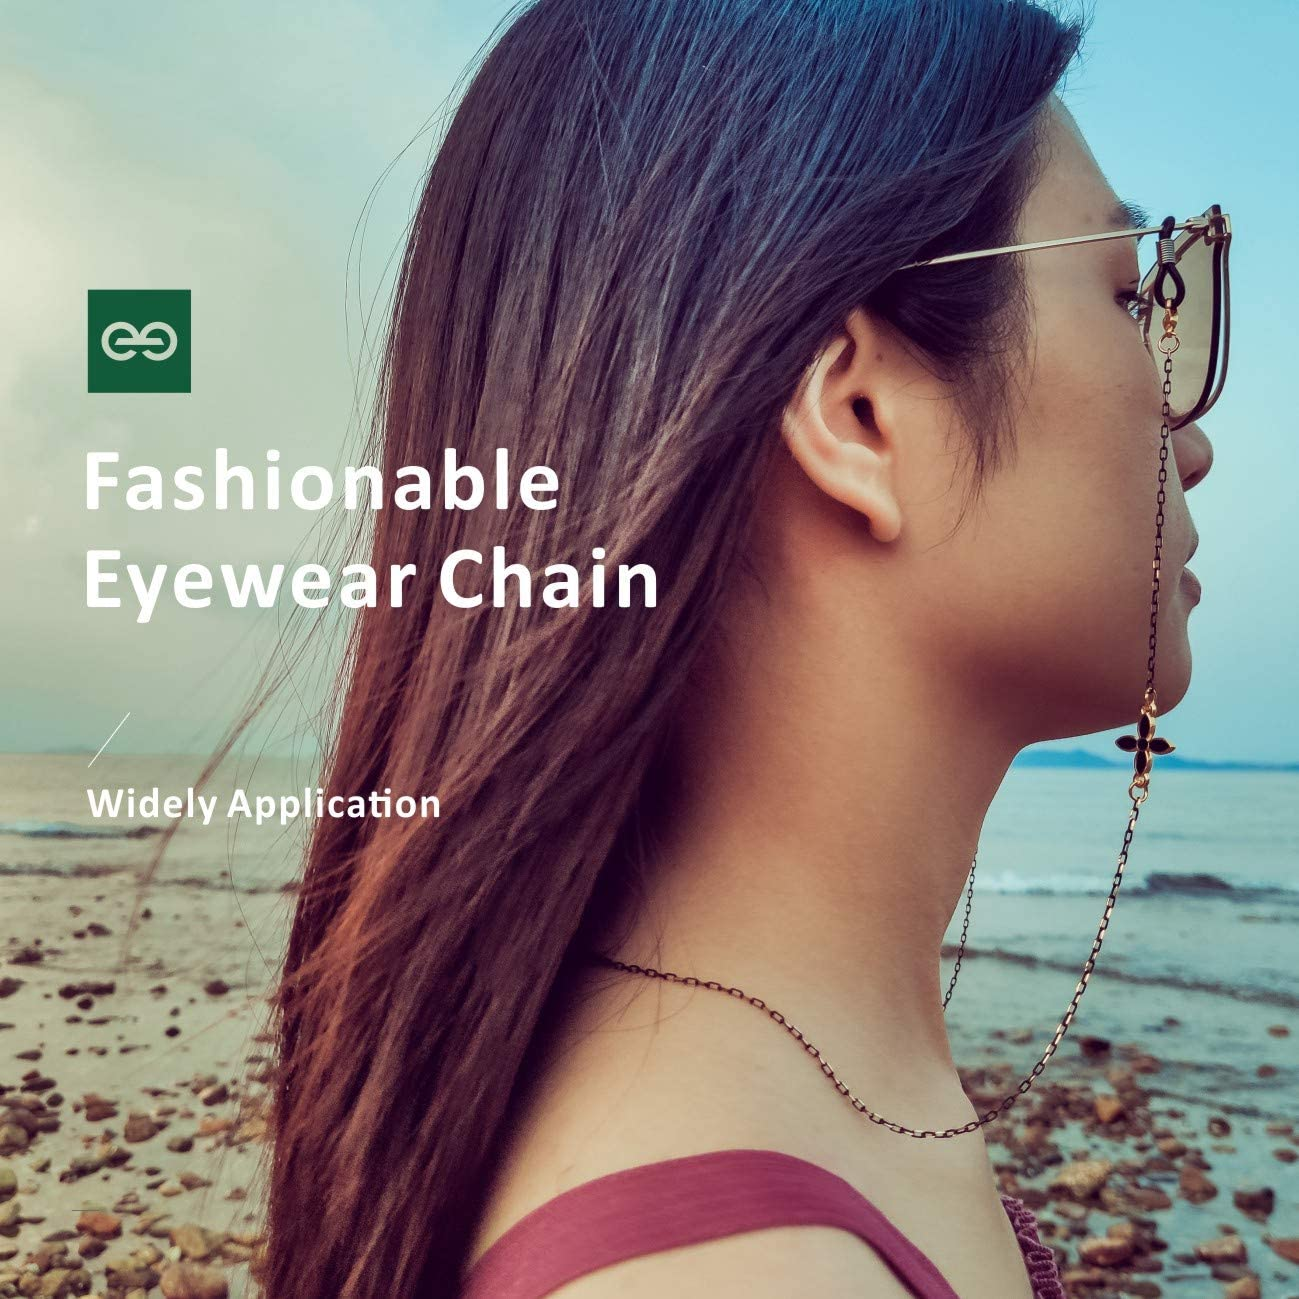 Cord/ón para gafas de sol Gafas de lectura Cordones con anillo de goma antideslizante Correa retenedora de gafas Eli-time Cadena de anteojos para mujer Collar Lady